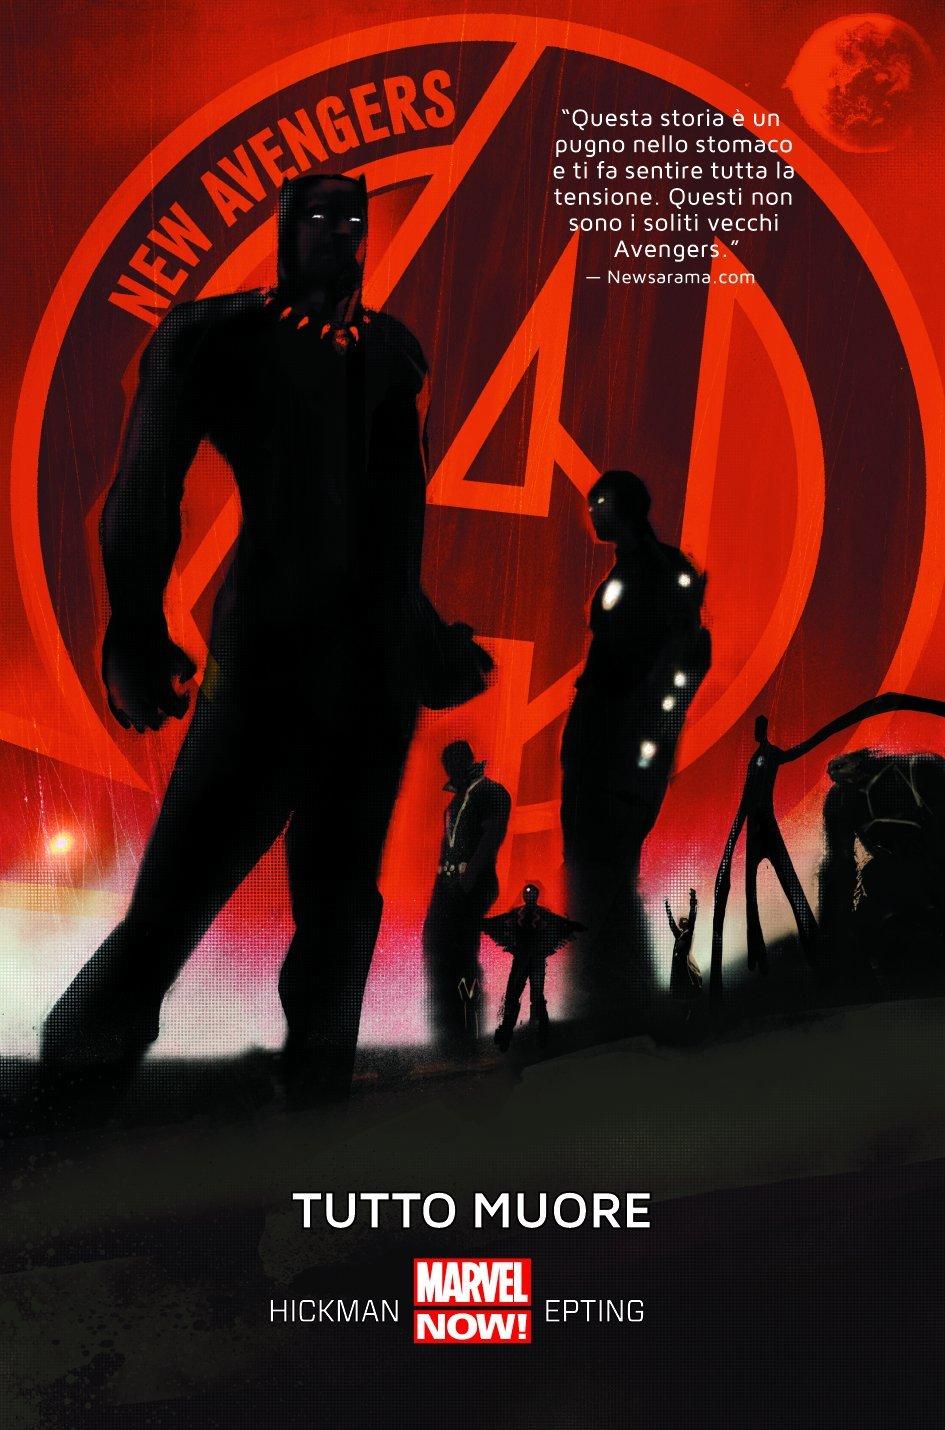 New Avengers vol. 1